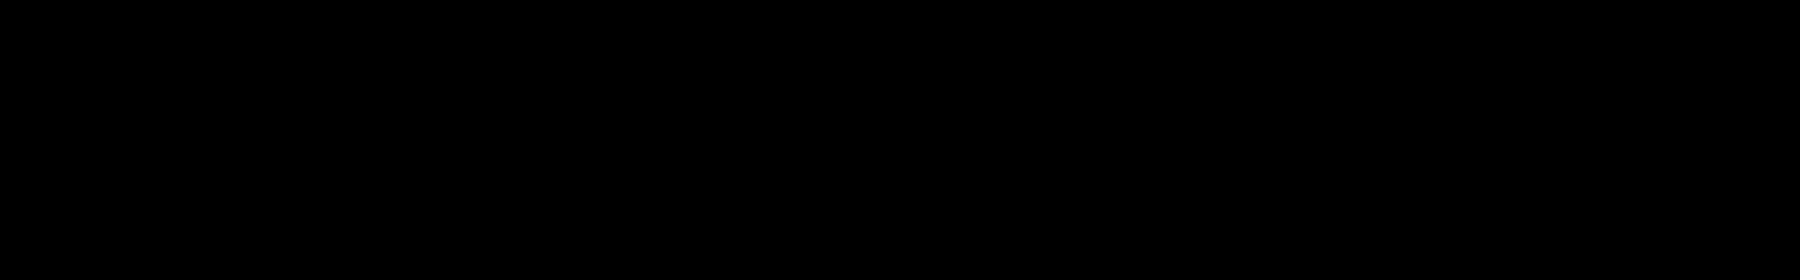 MAJOR LAZERZ VOL.2 audio waveform